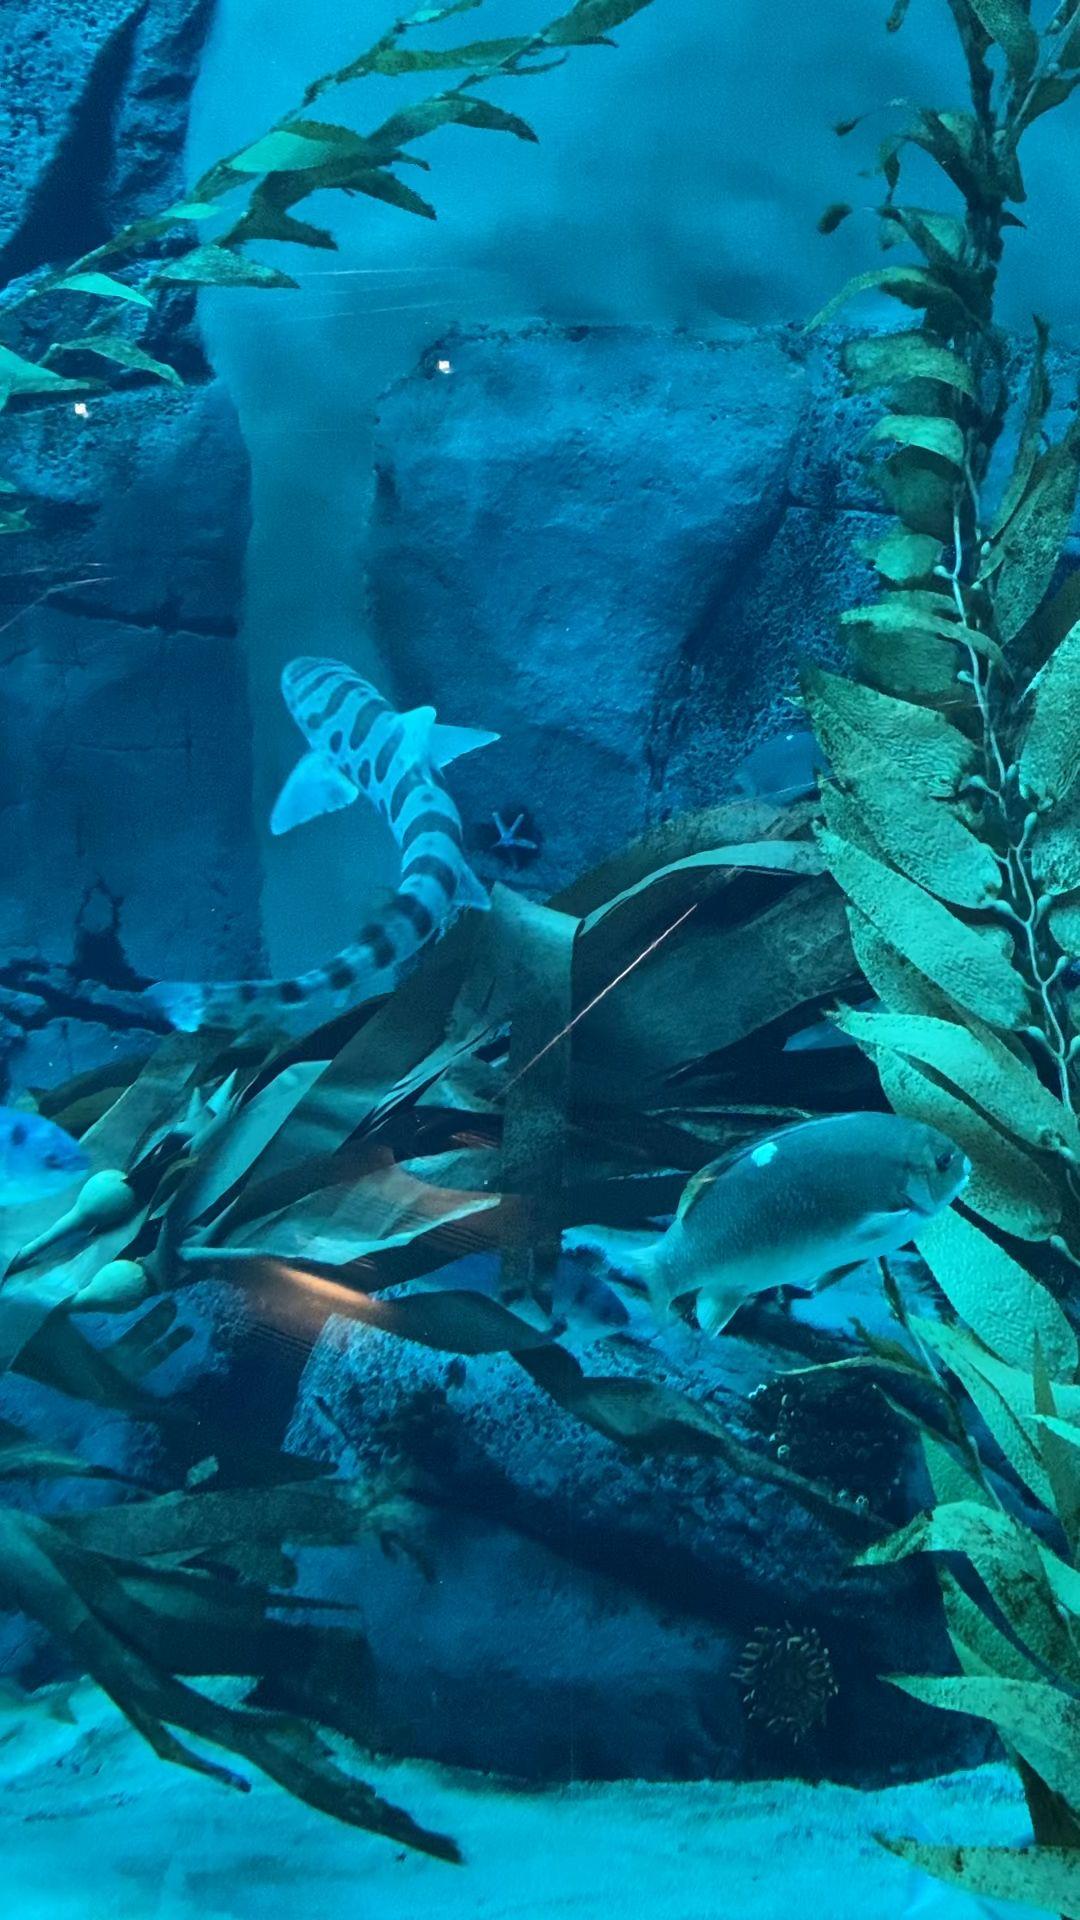 I just had to share how serene it was watching these beautiful underwater swimmers cruise around! #sandiegocalifornia #zooanimals #artwork #serenity #iphonewallpaper